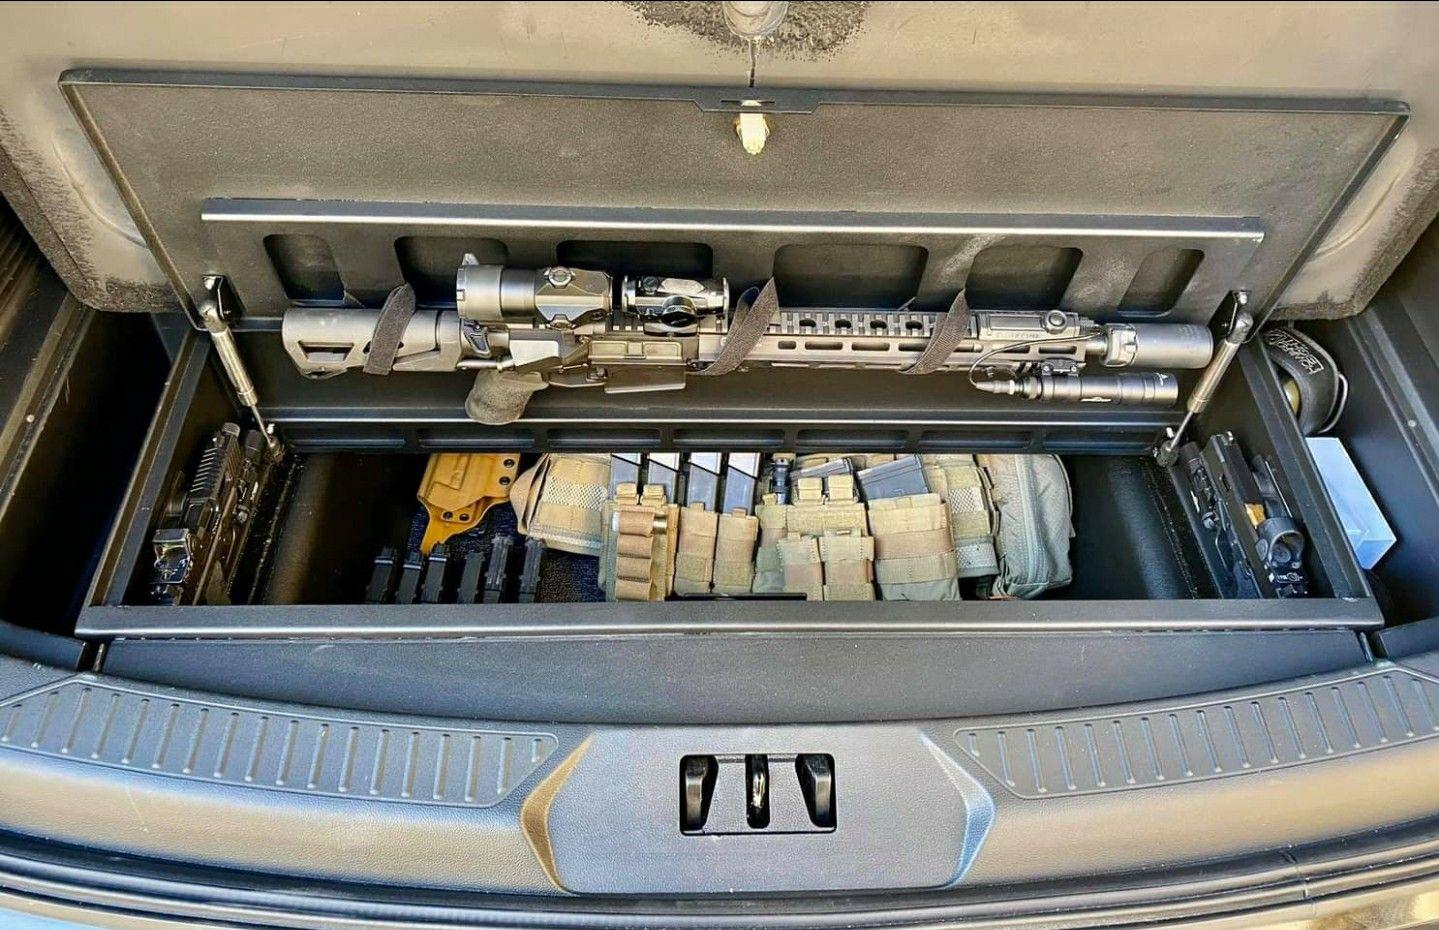 2020 Ford Explorer St Trunk Mod In 2020 2020 Ford Explorer Ford Explorer Ford